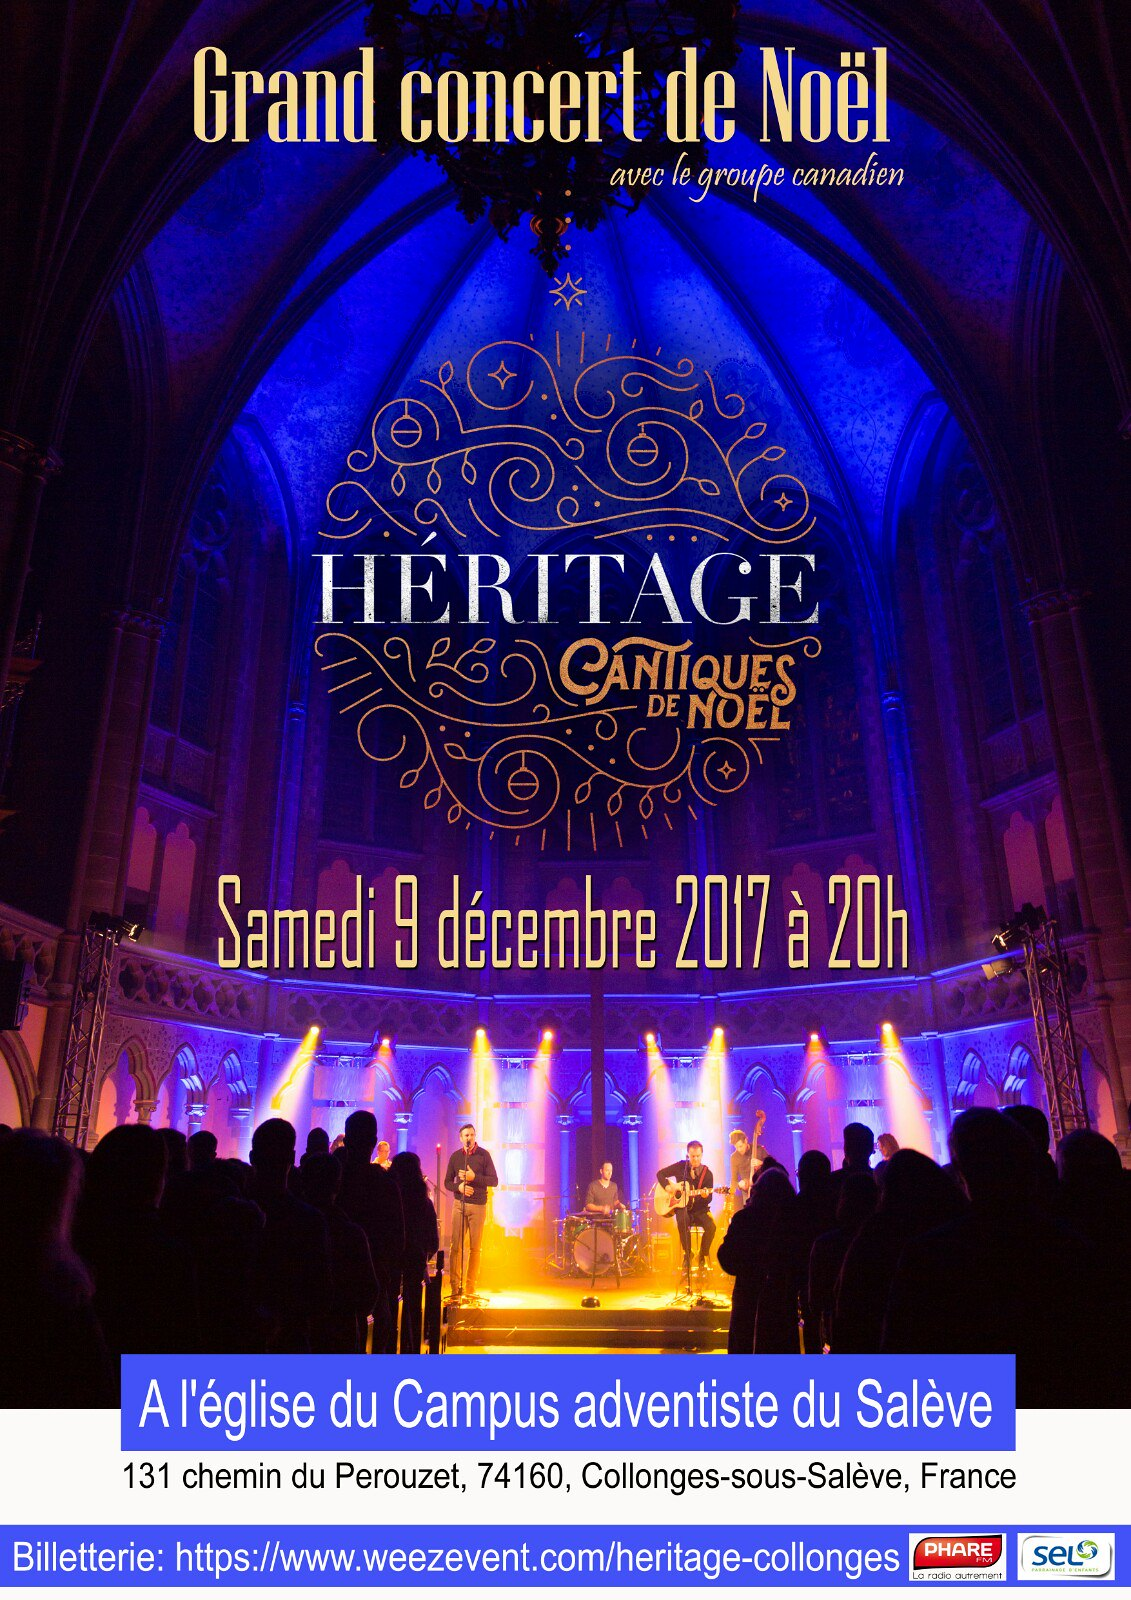 Heritage Noel Collonges sous Saleve